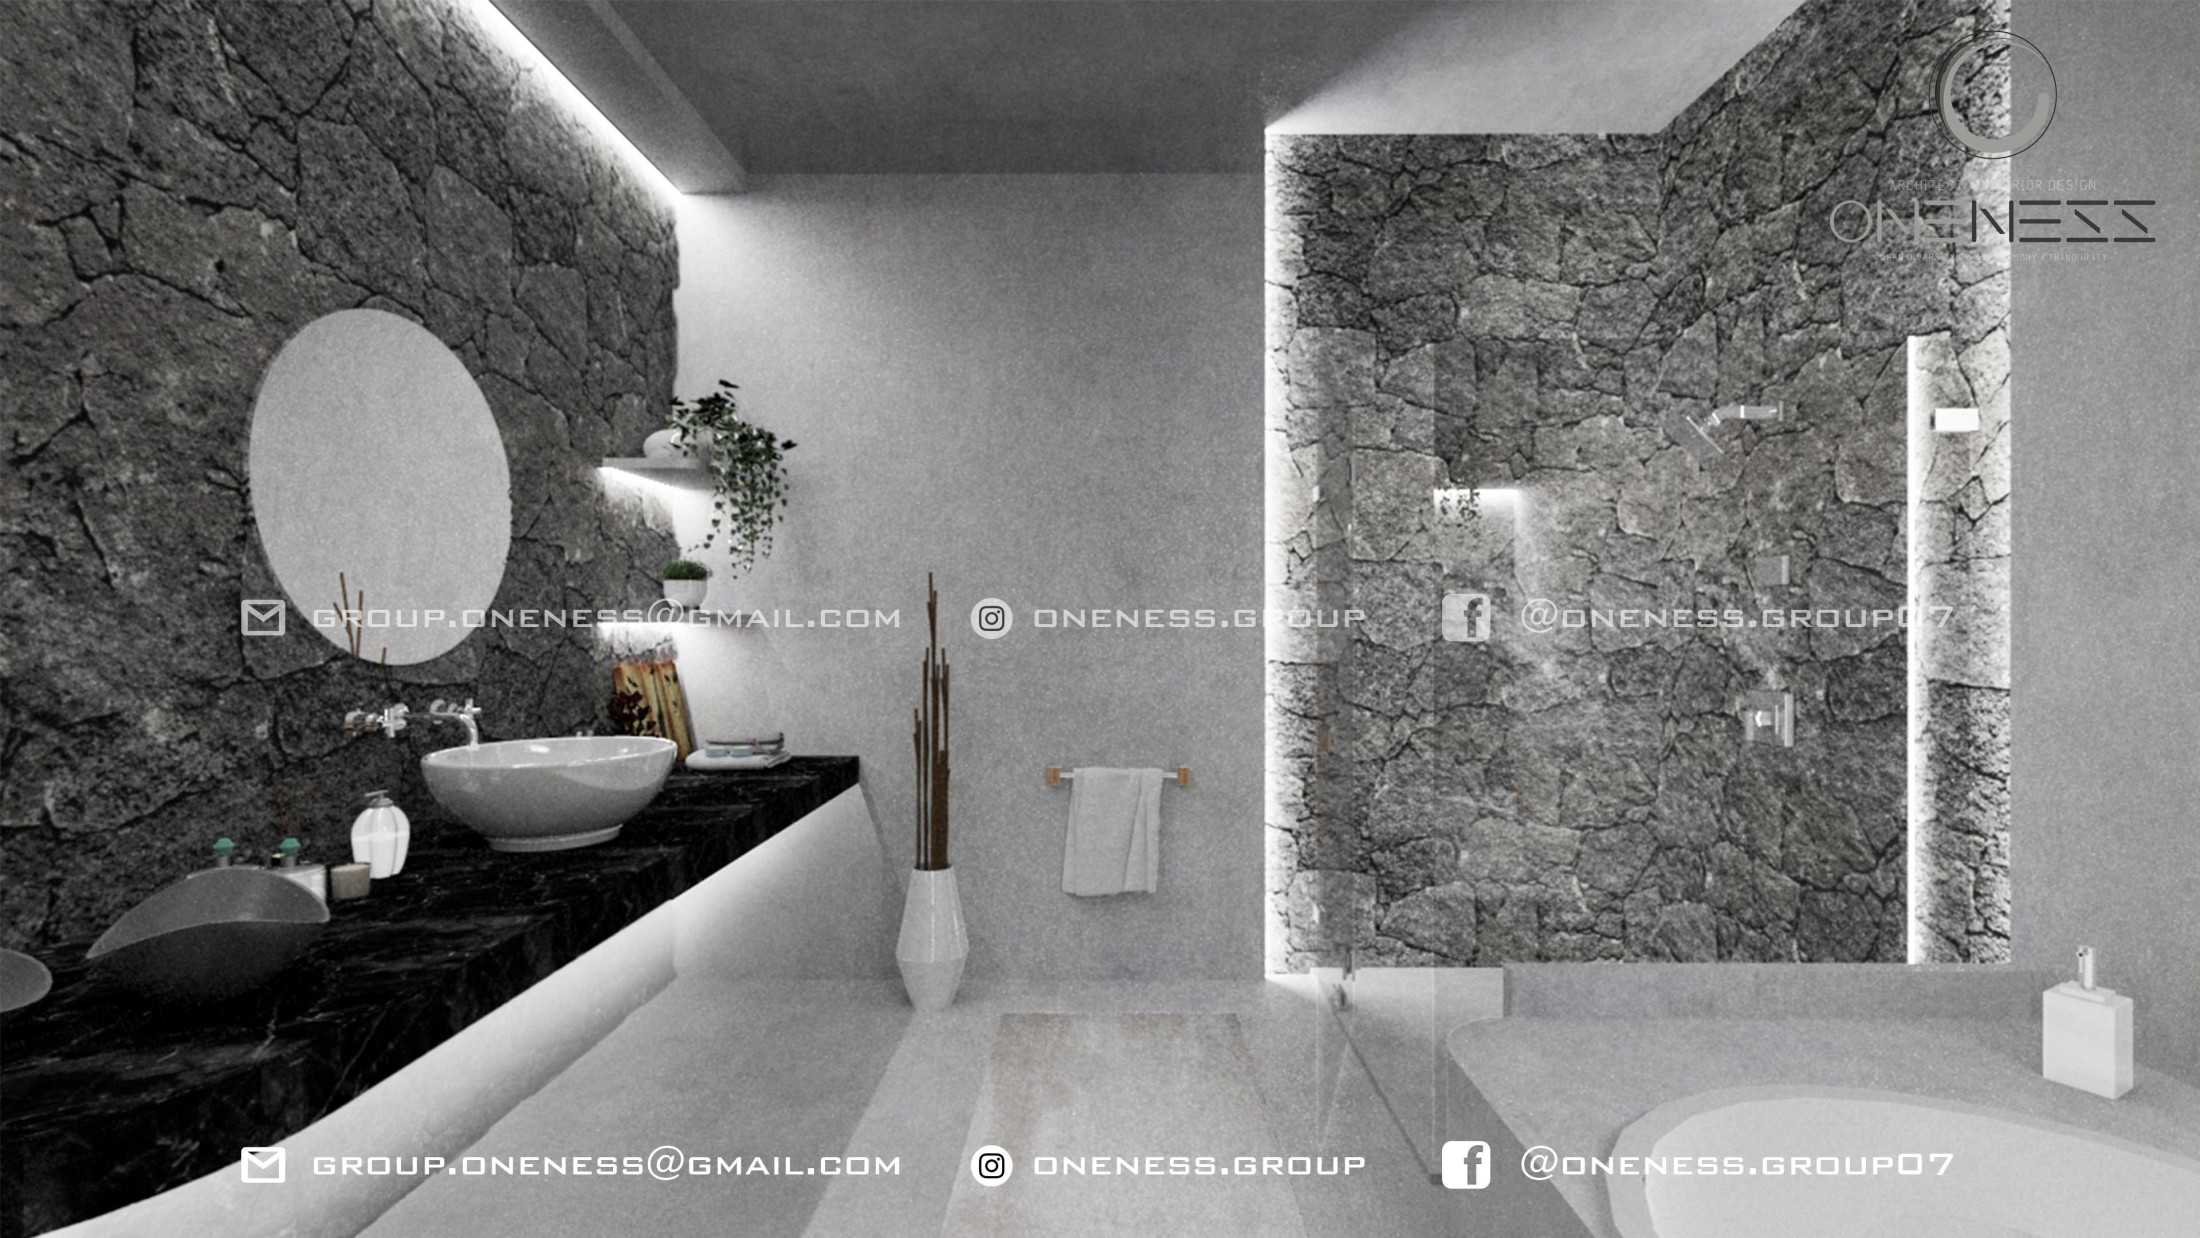 Oneness Group Villa Hijau Bali Bali, Indonesia Bali, Indonesia Toilet  98252